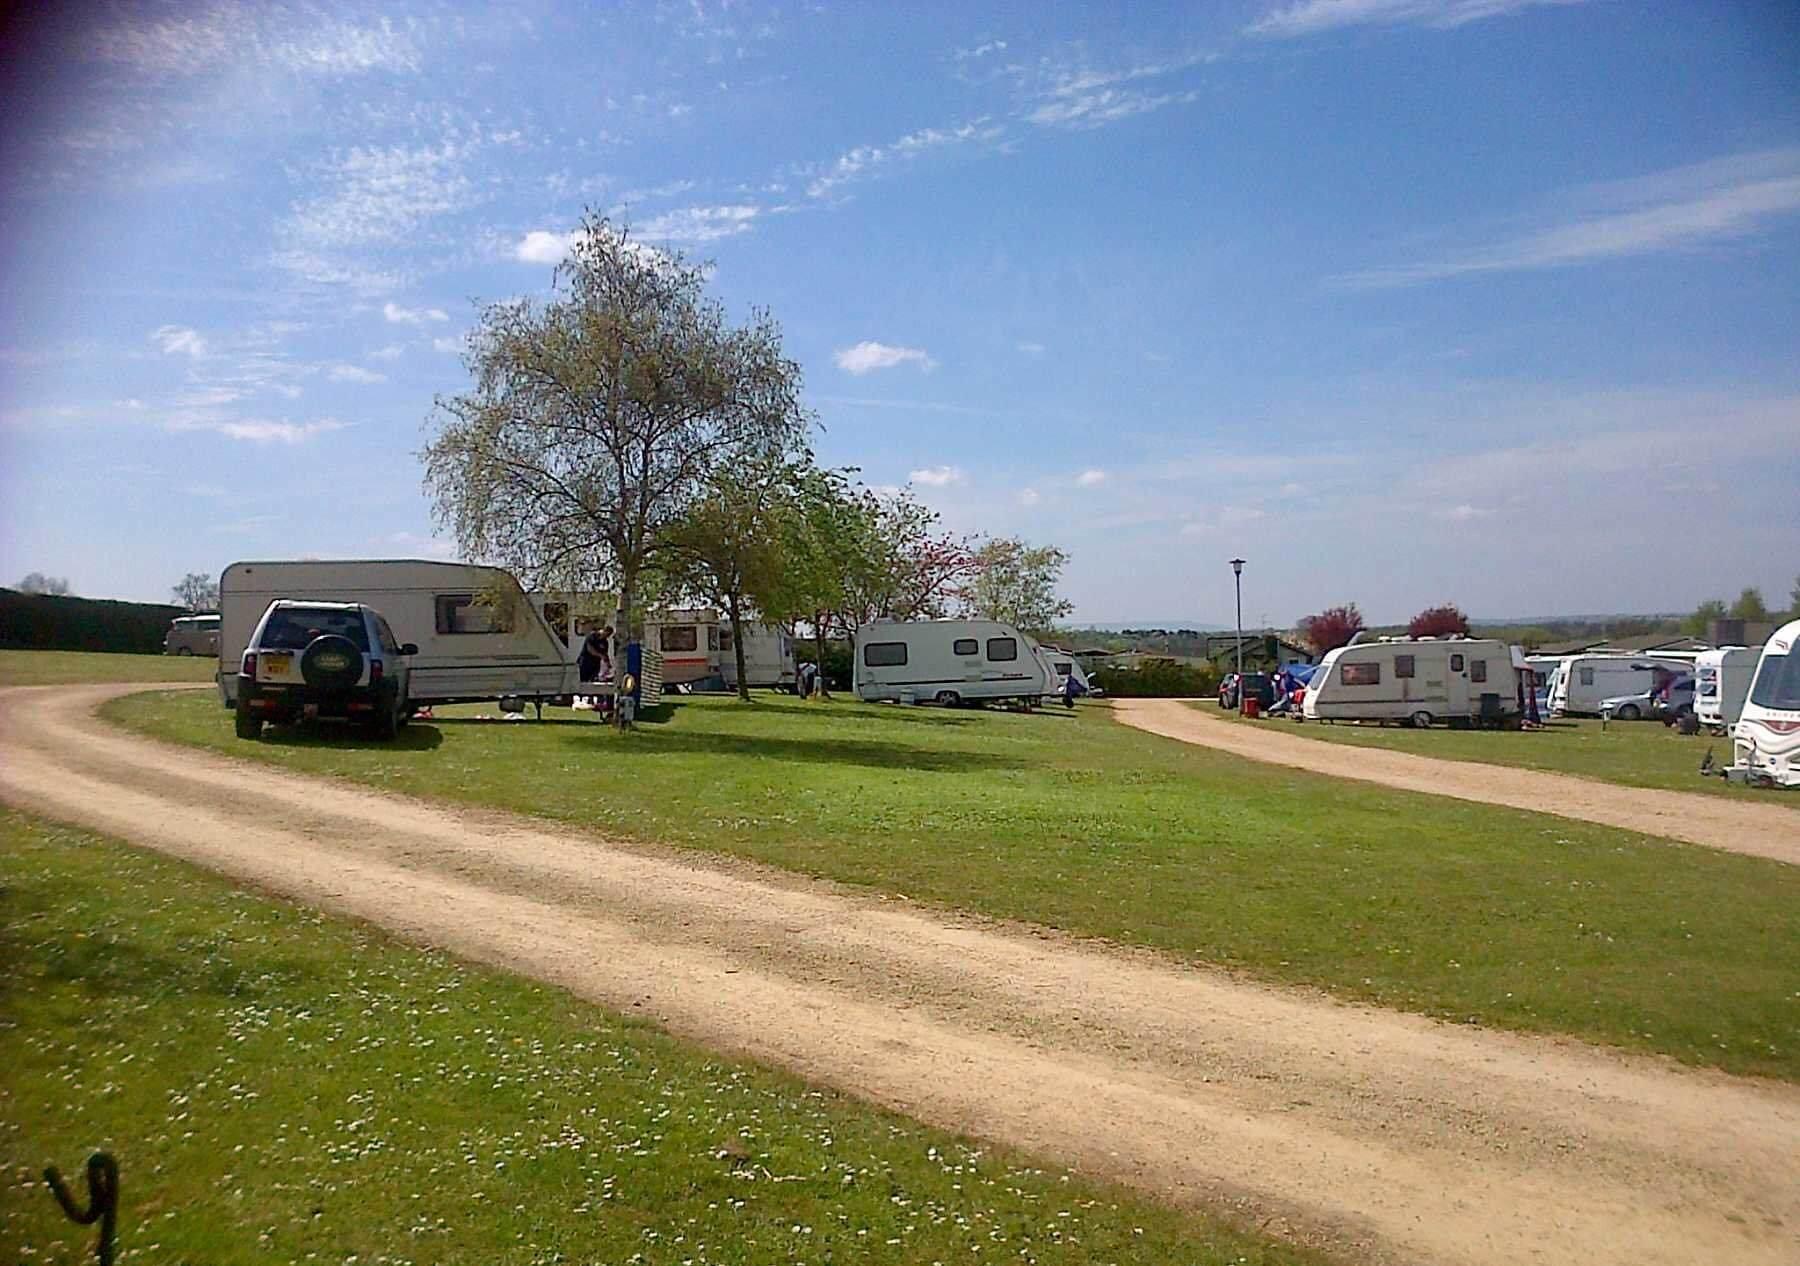 Dodwell Park Camping & Caravan Site